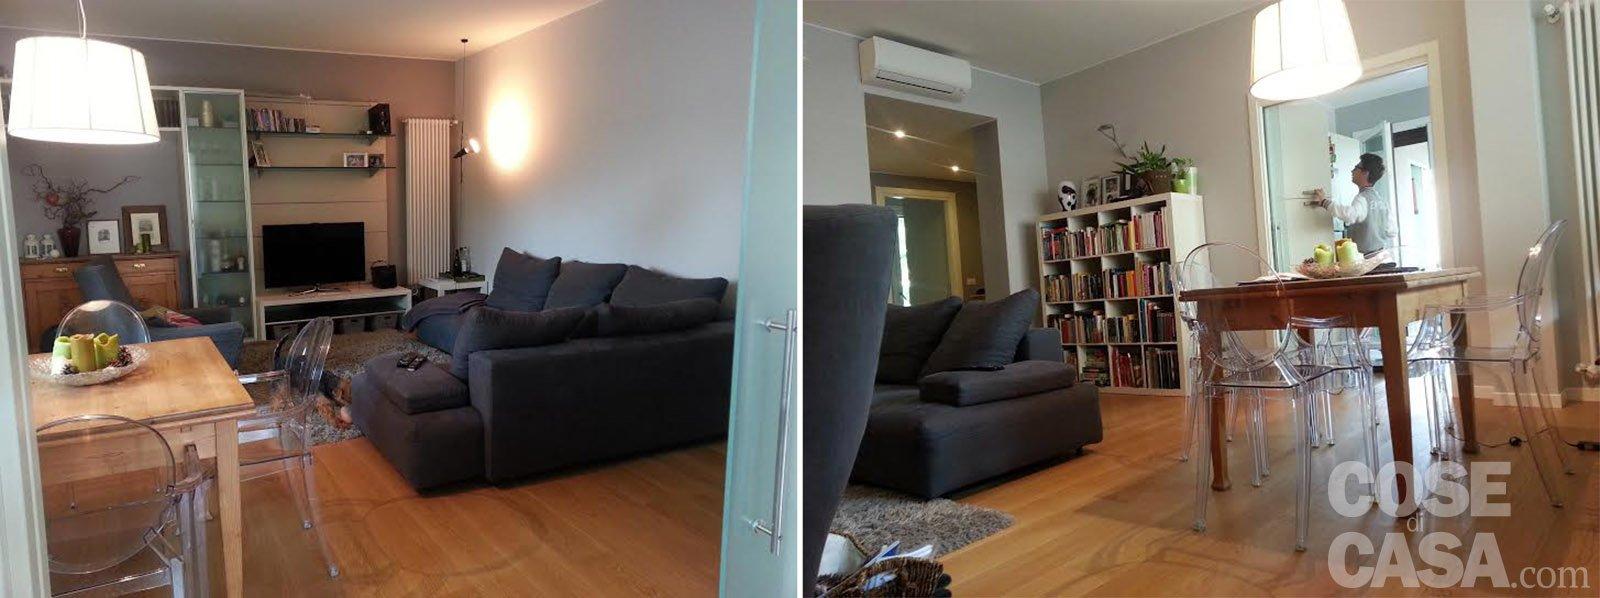 Arredamento classico ikea: ikea for the home rugs and living room.